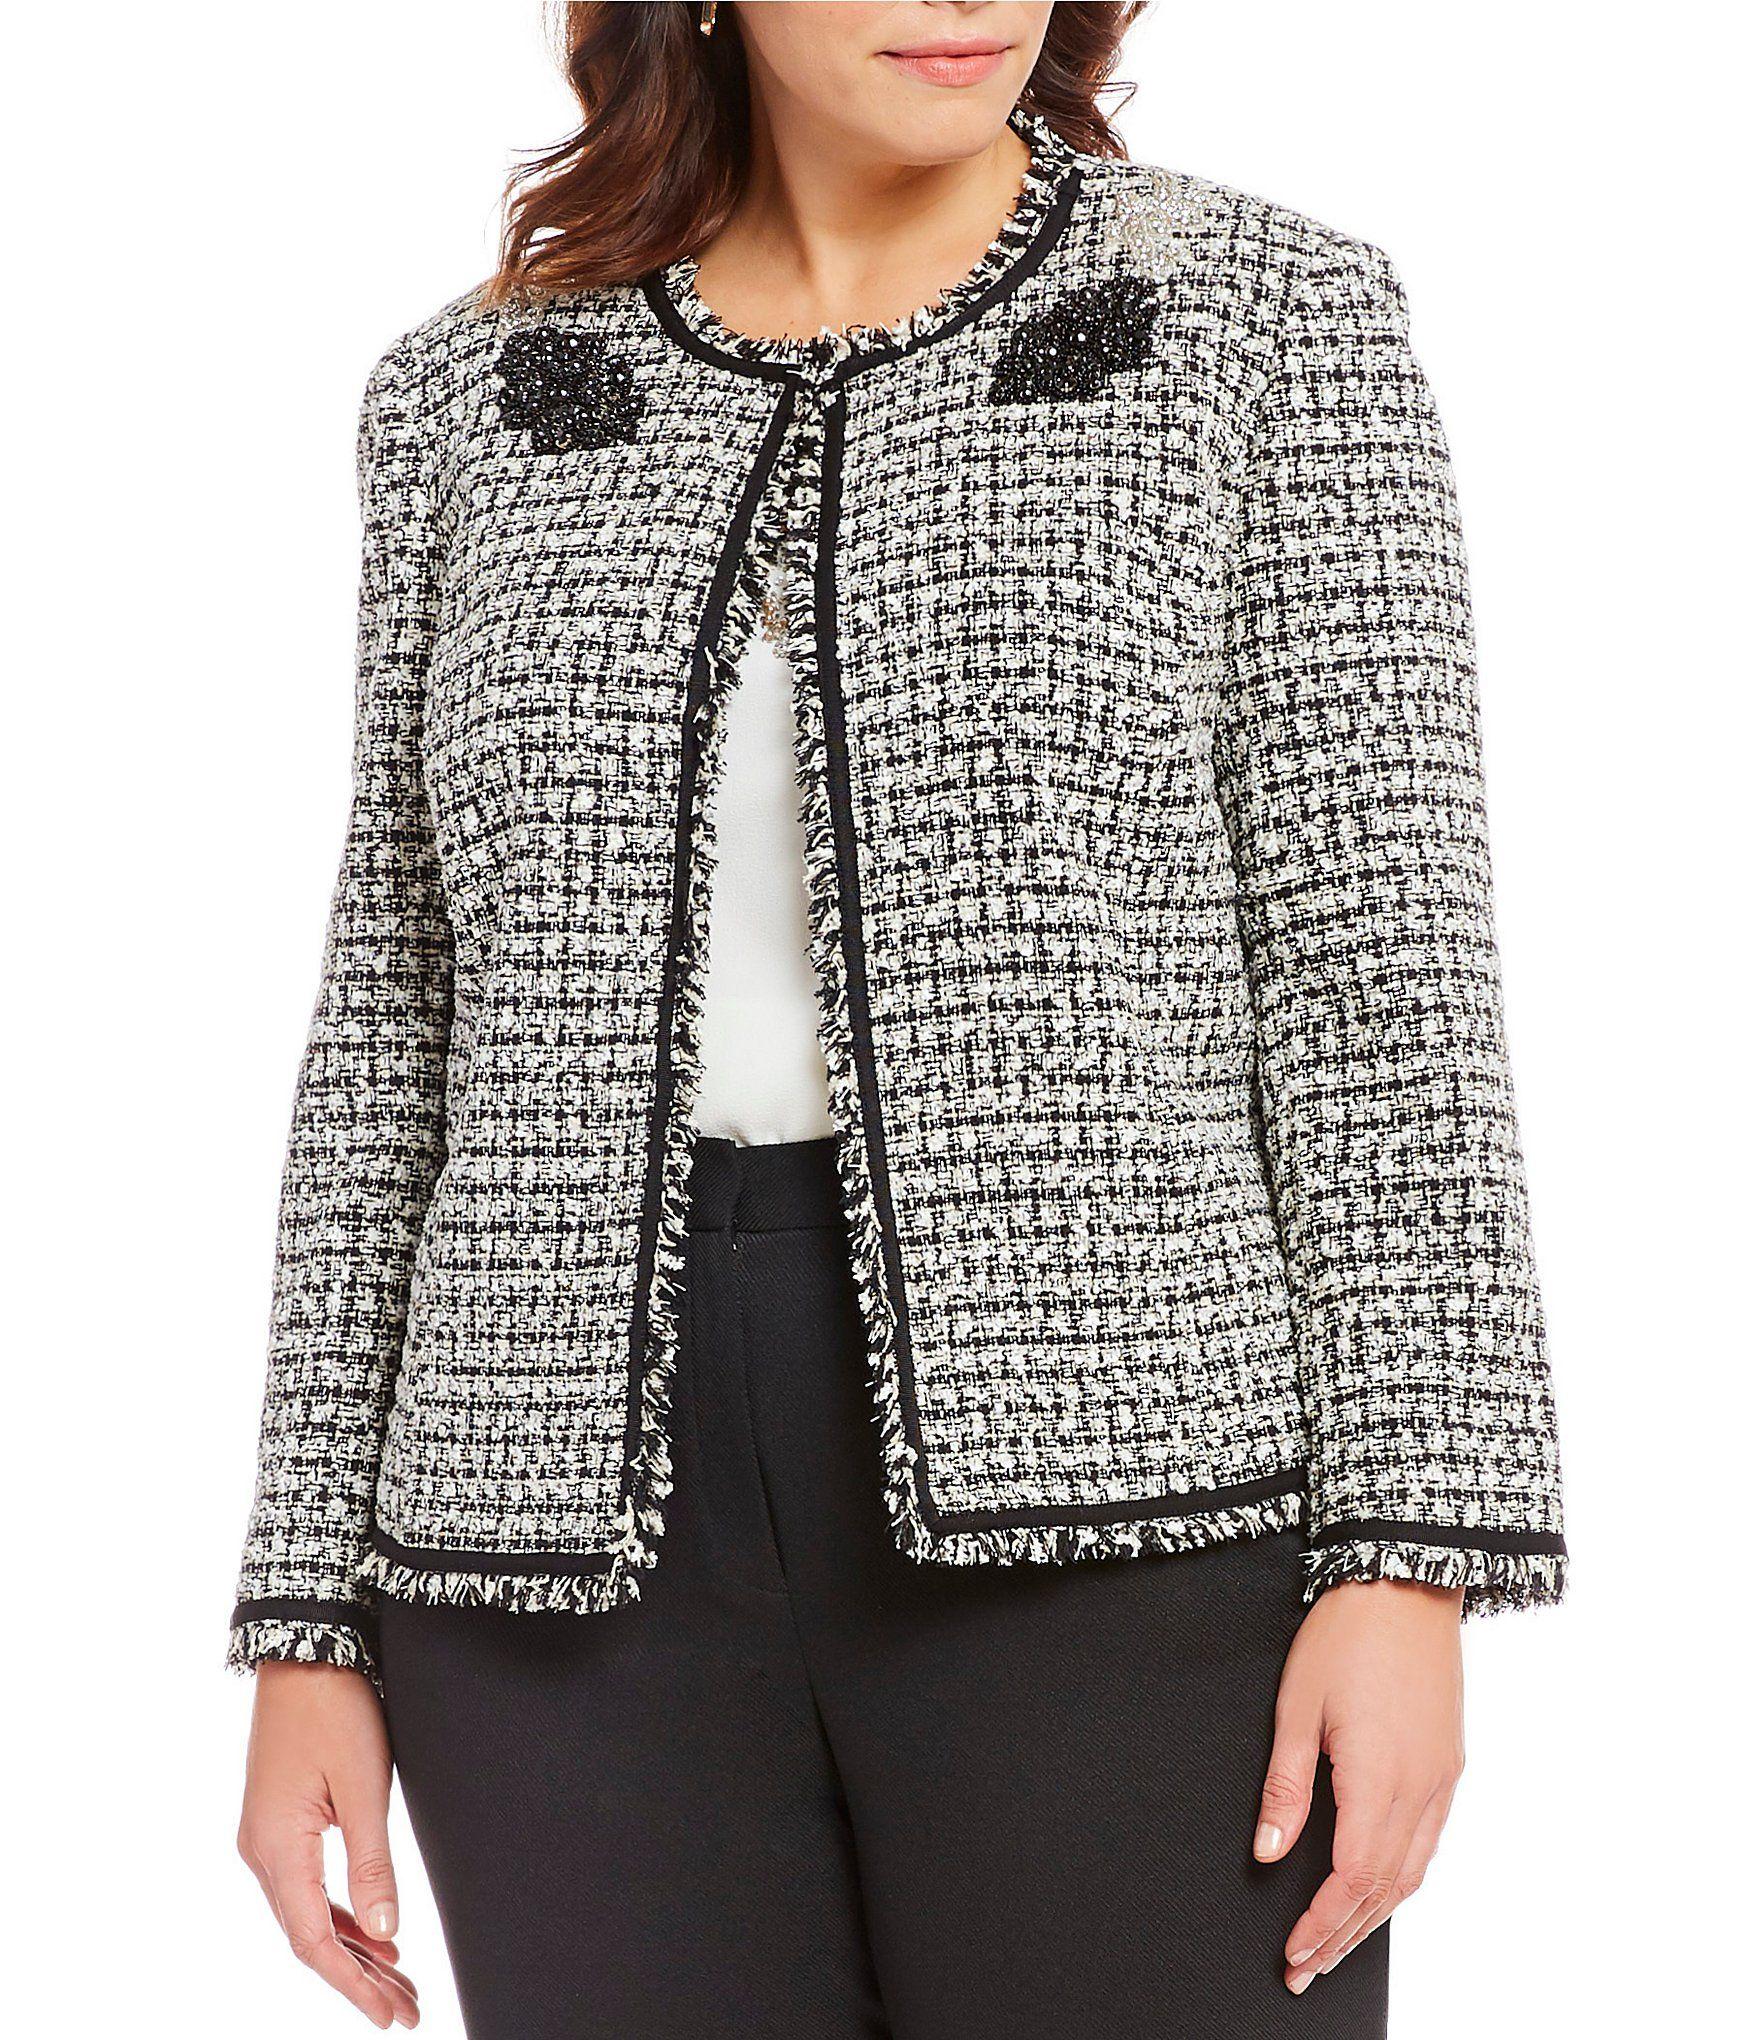 9541e4e0772 Tahari ASL Plus Size Embellished Applique Fringe Trim Boucle Jacket   Dillards